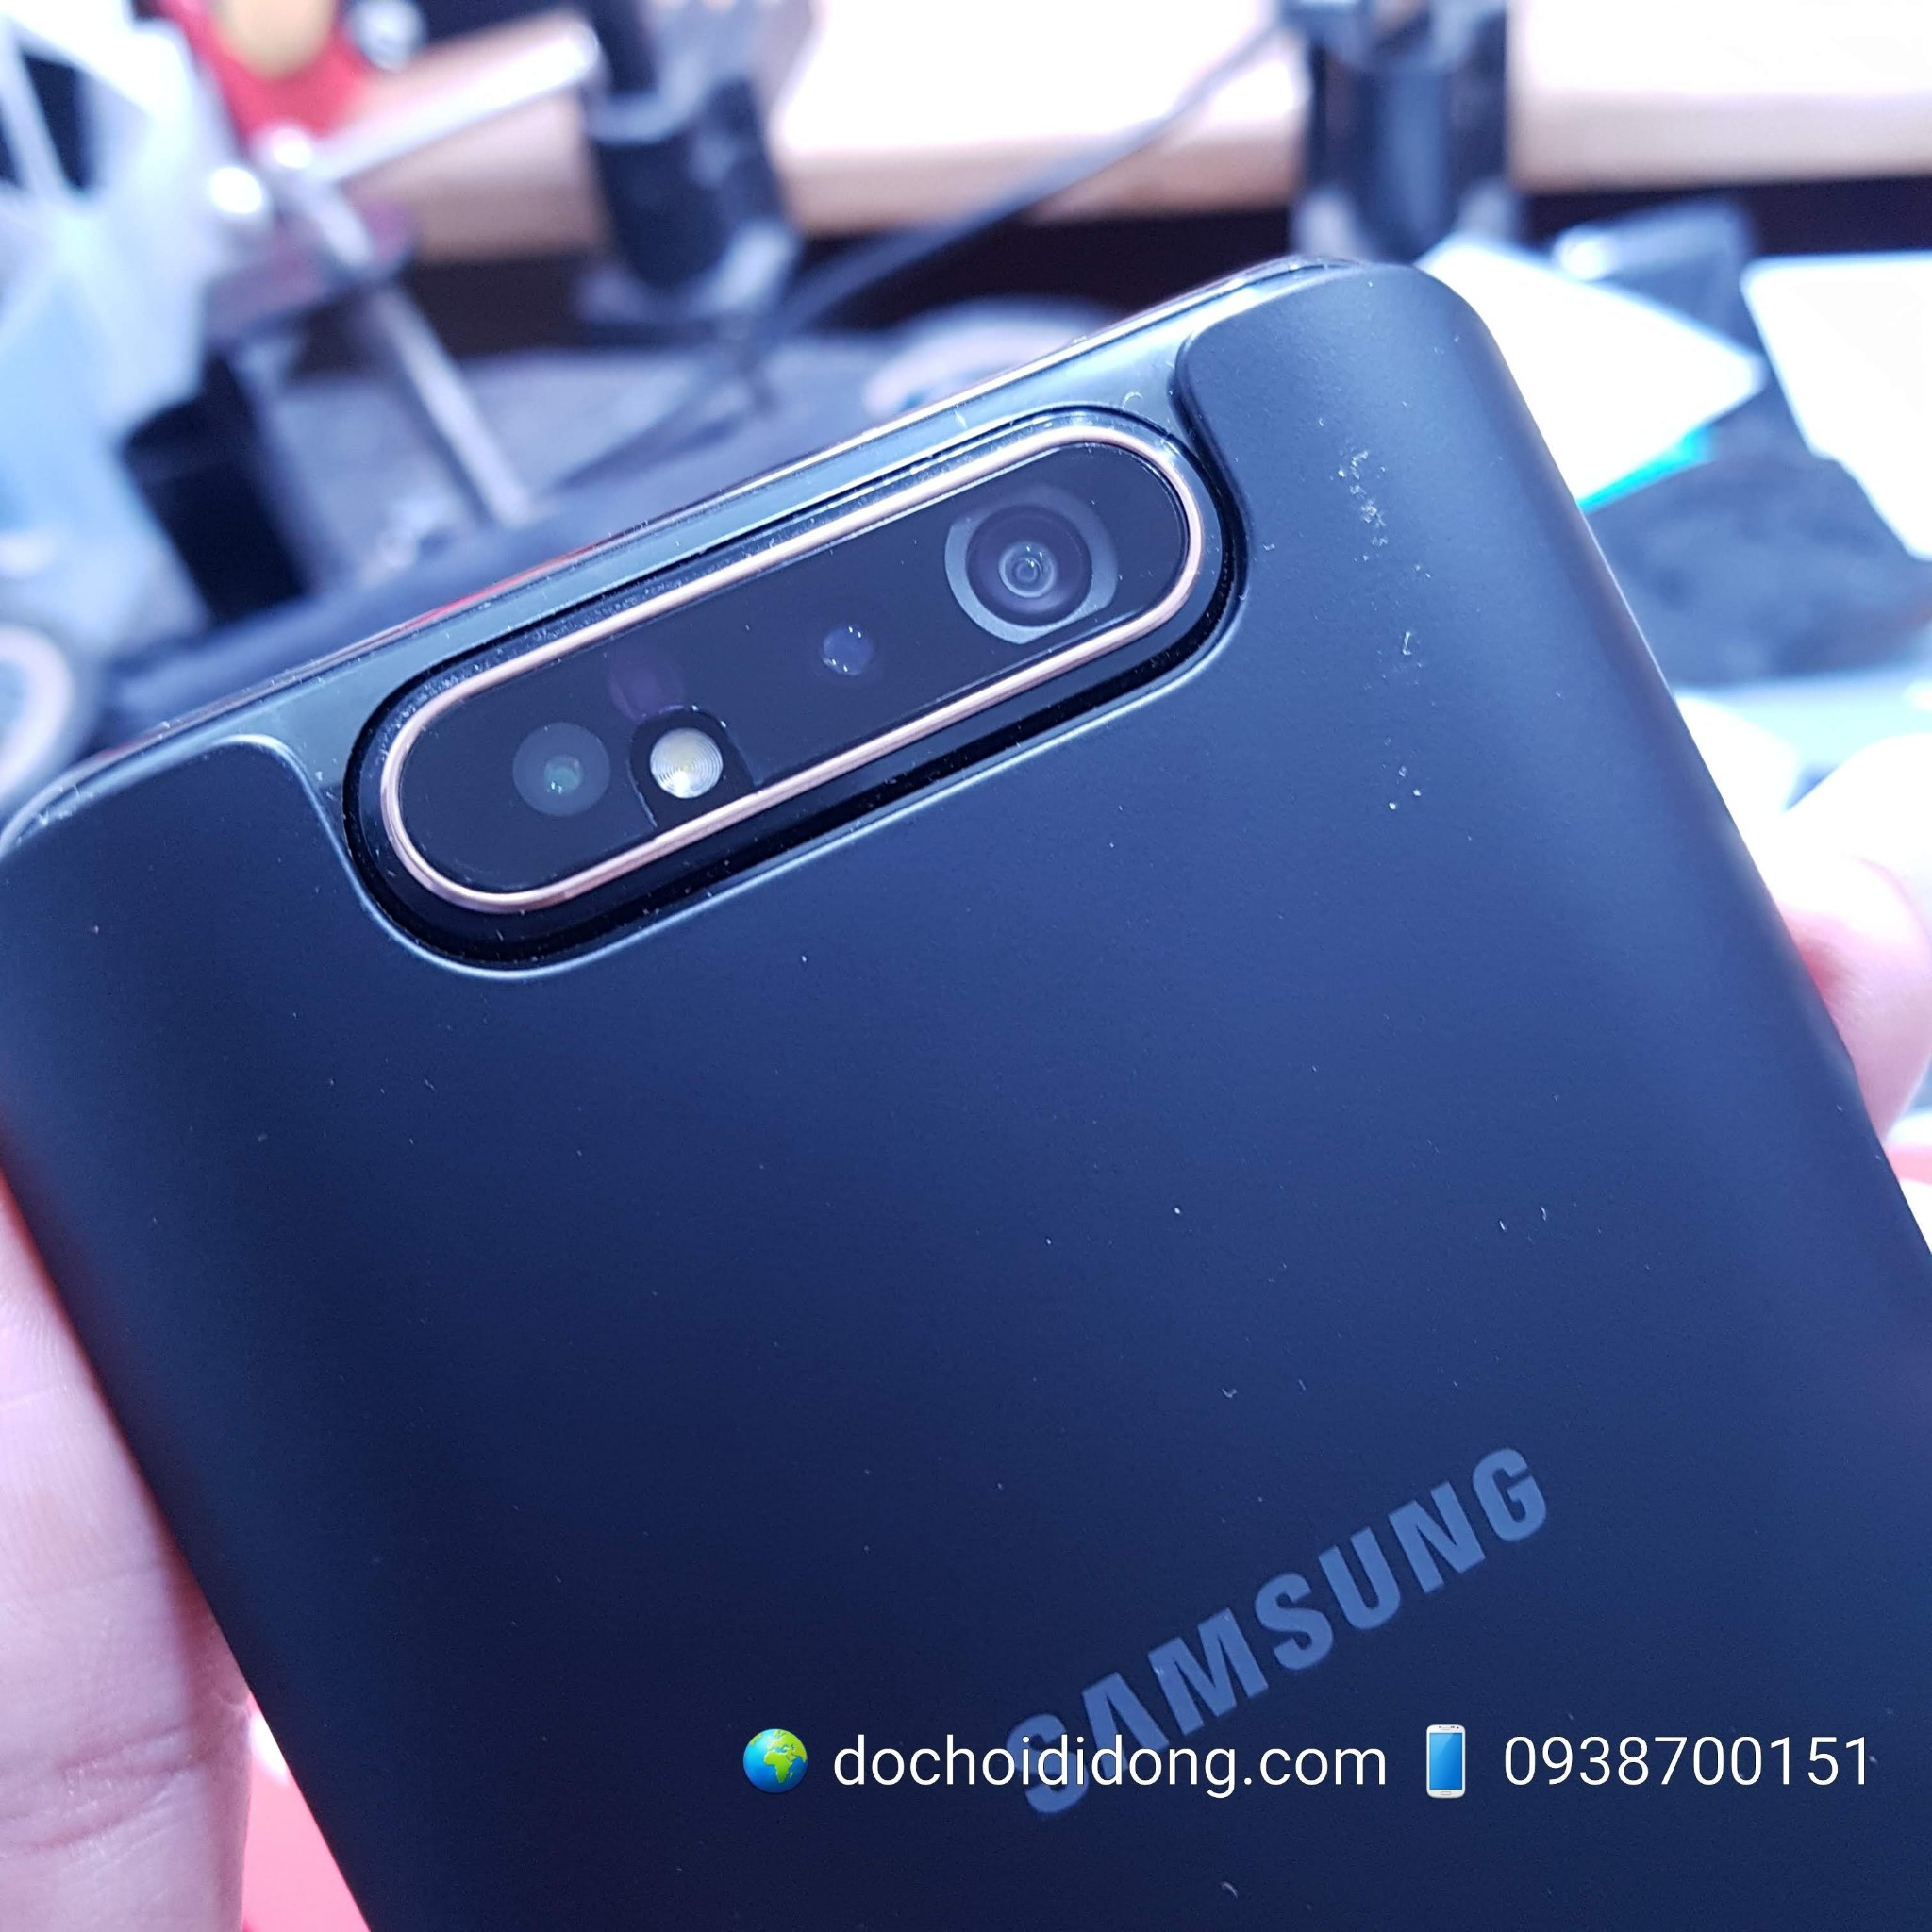 mieng-dan-cuong-luc-camera-samsung-a80-a90-2-5d